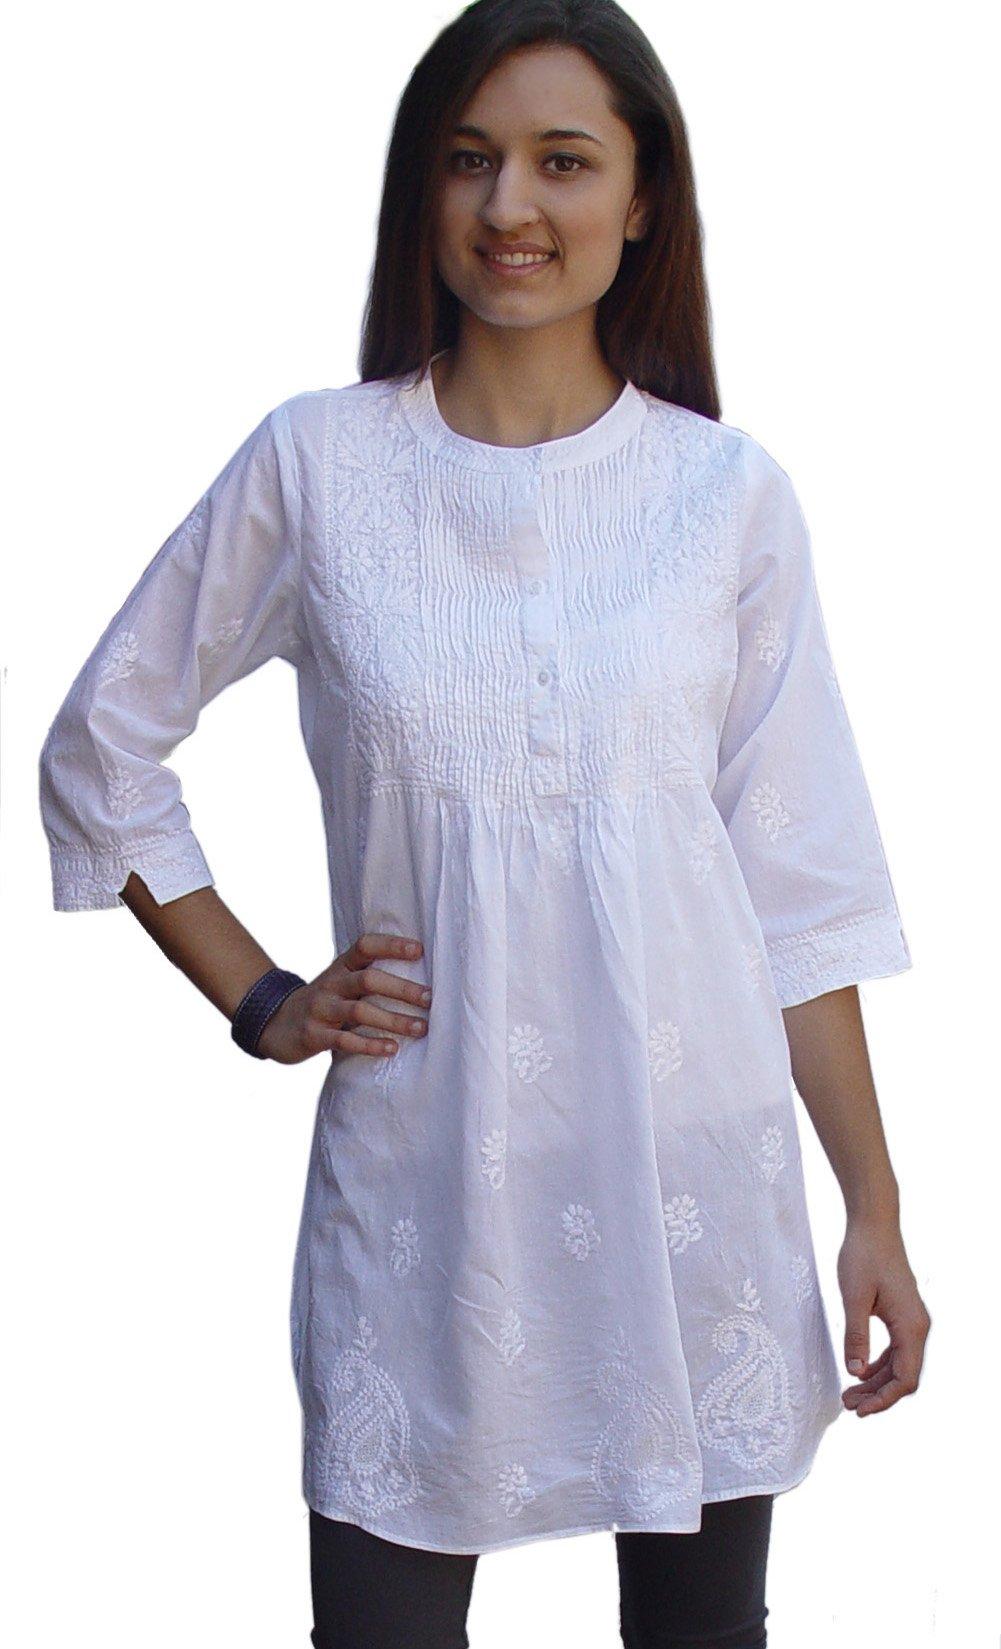 Ayurvastram Bibab Pure Cottn Hand Embroidered Front Pleated Tunic Top Kurti: White, 32W